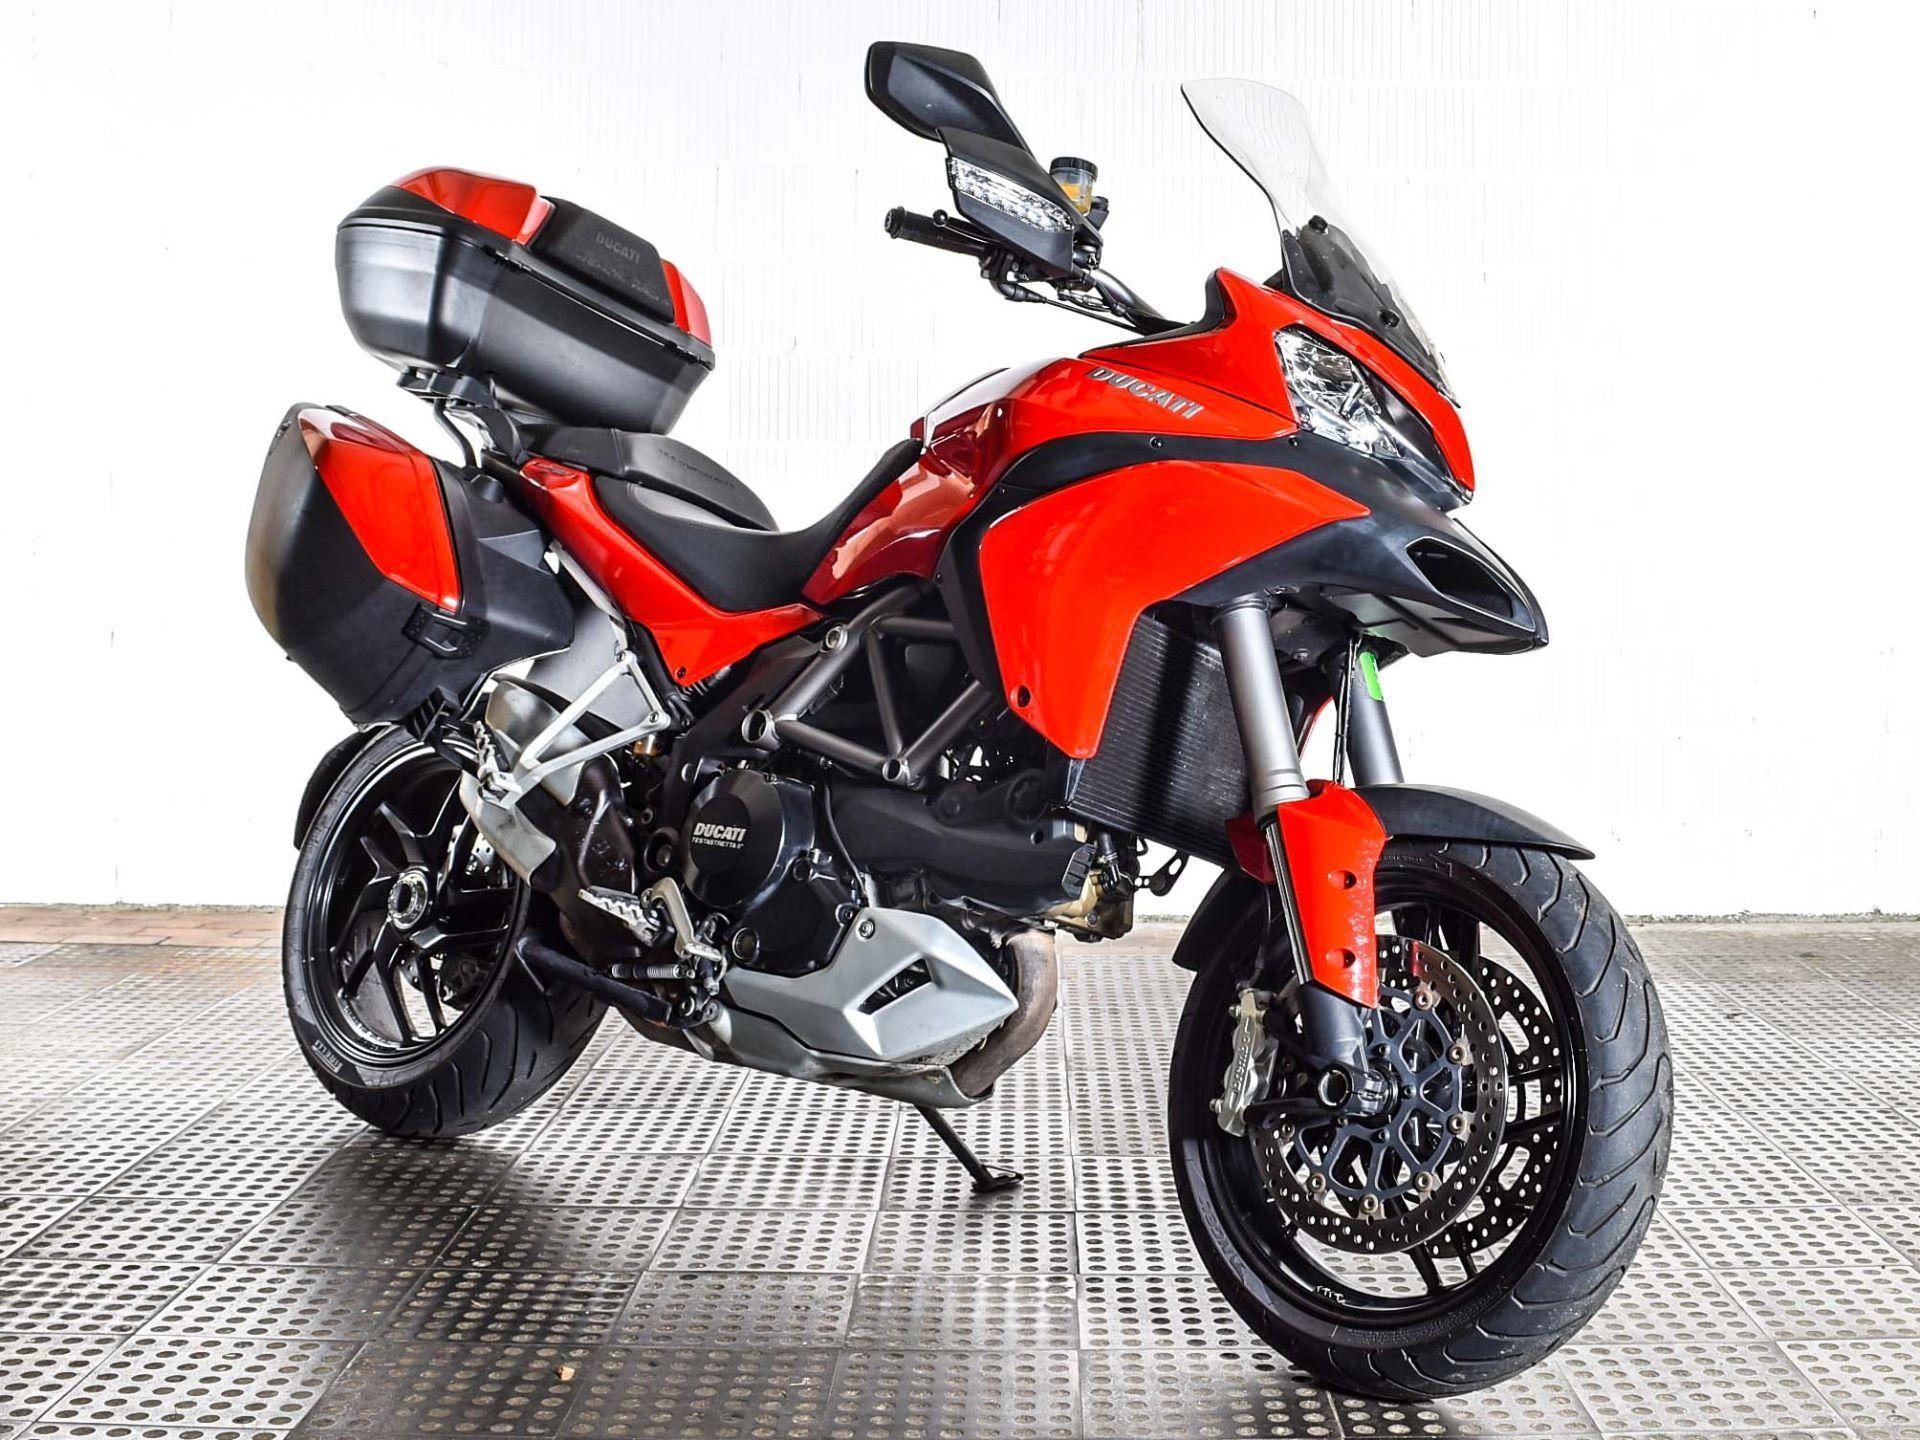 moto occasions acheter ducati 1200 multistrada s abs d air motocenter seetal hochdorf. Black Bedroom Furniture Sets. Home Design Ideas